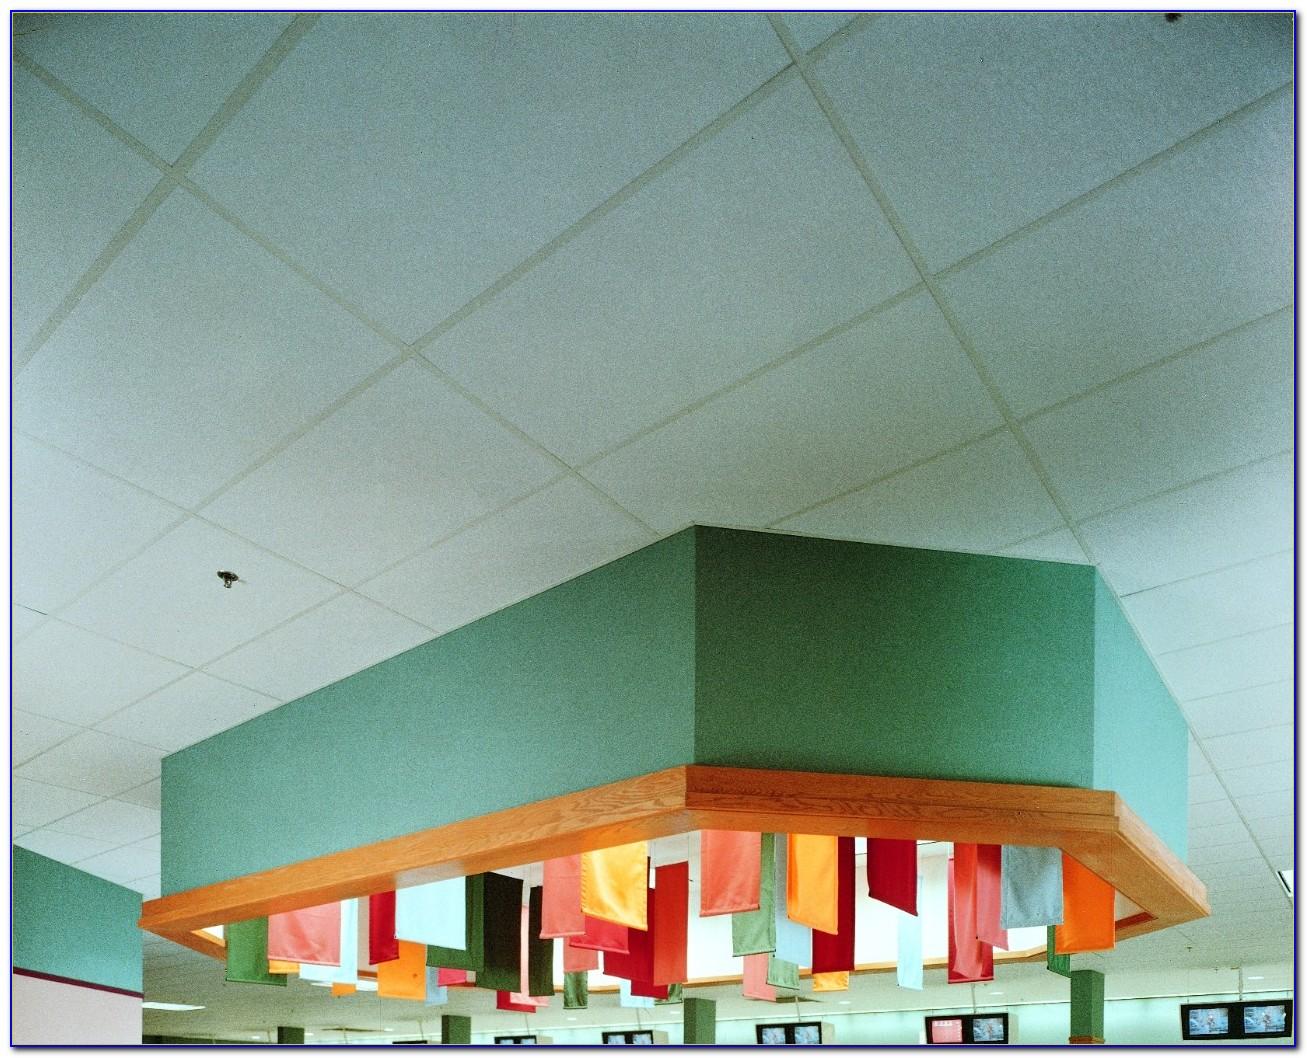 Food Grade Ceiling Tiles